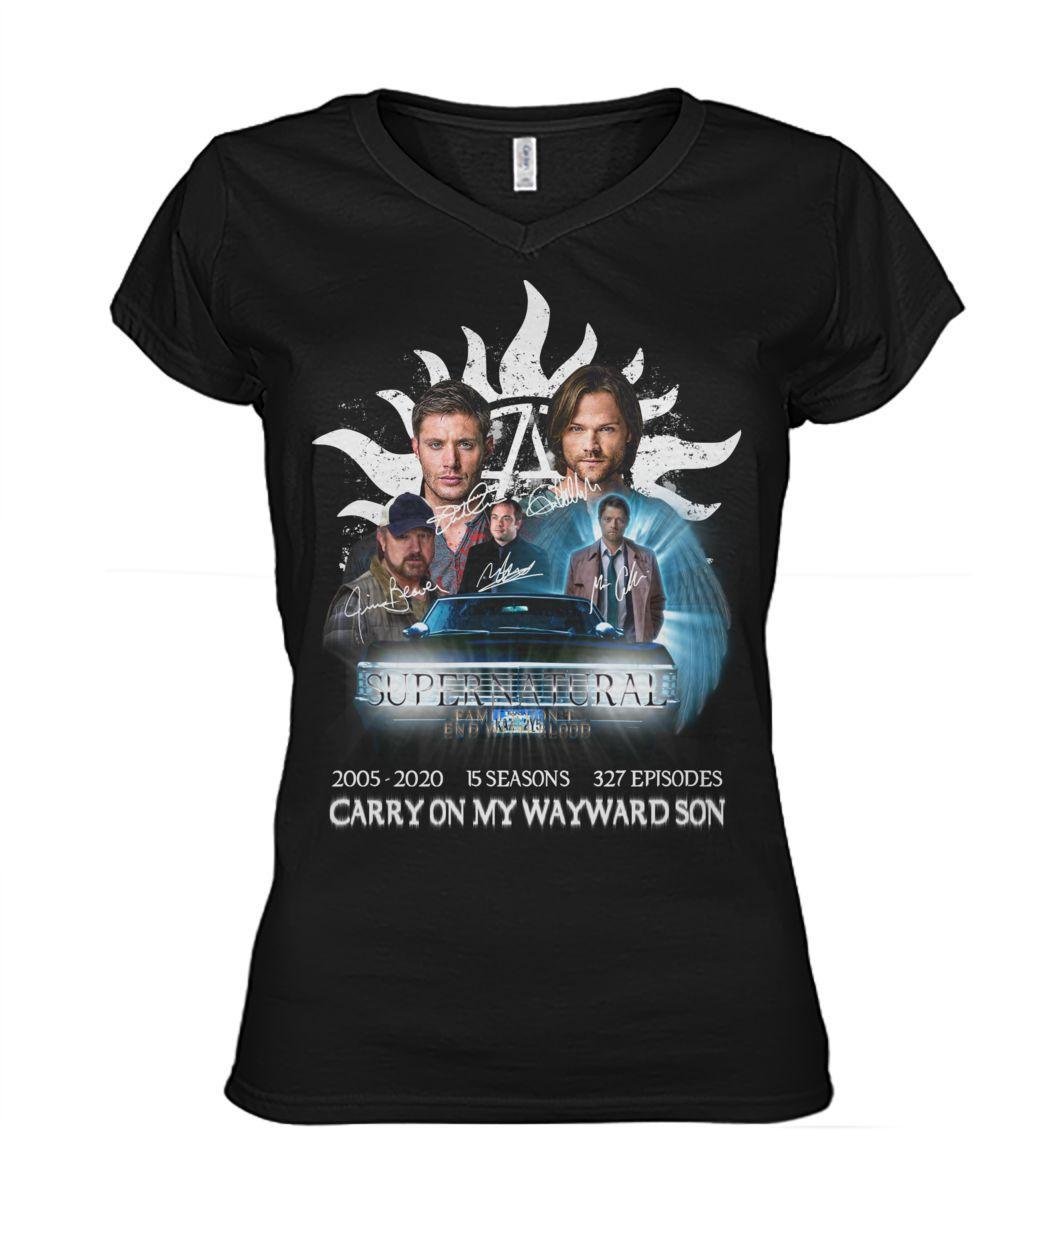 Supernatural 2005 2020 15 seasons 327 episodes Carry on my Wayward Son V-neck t-shirt